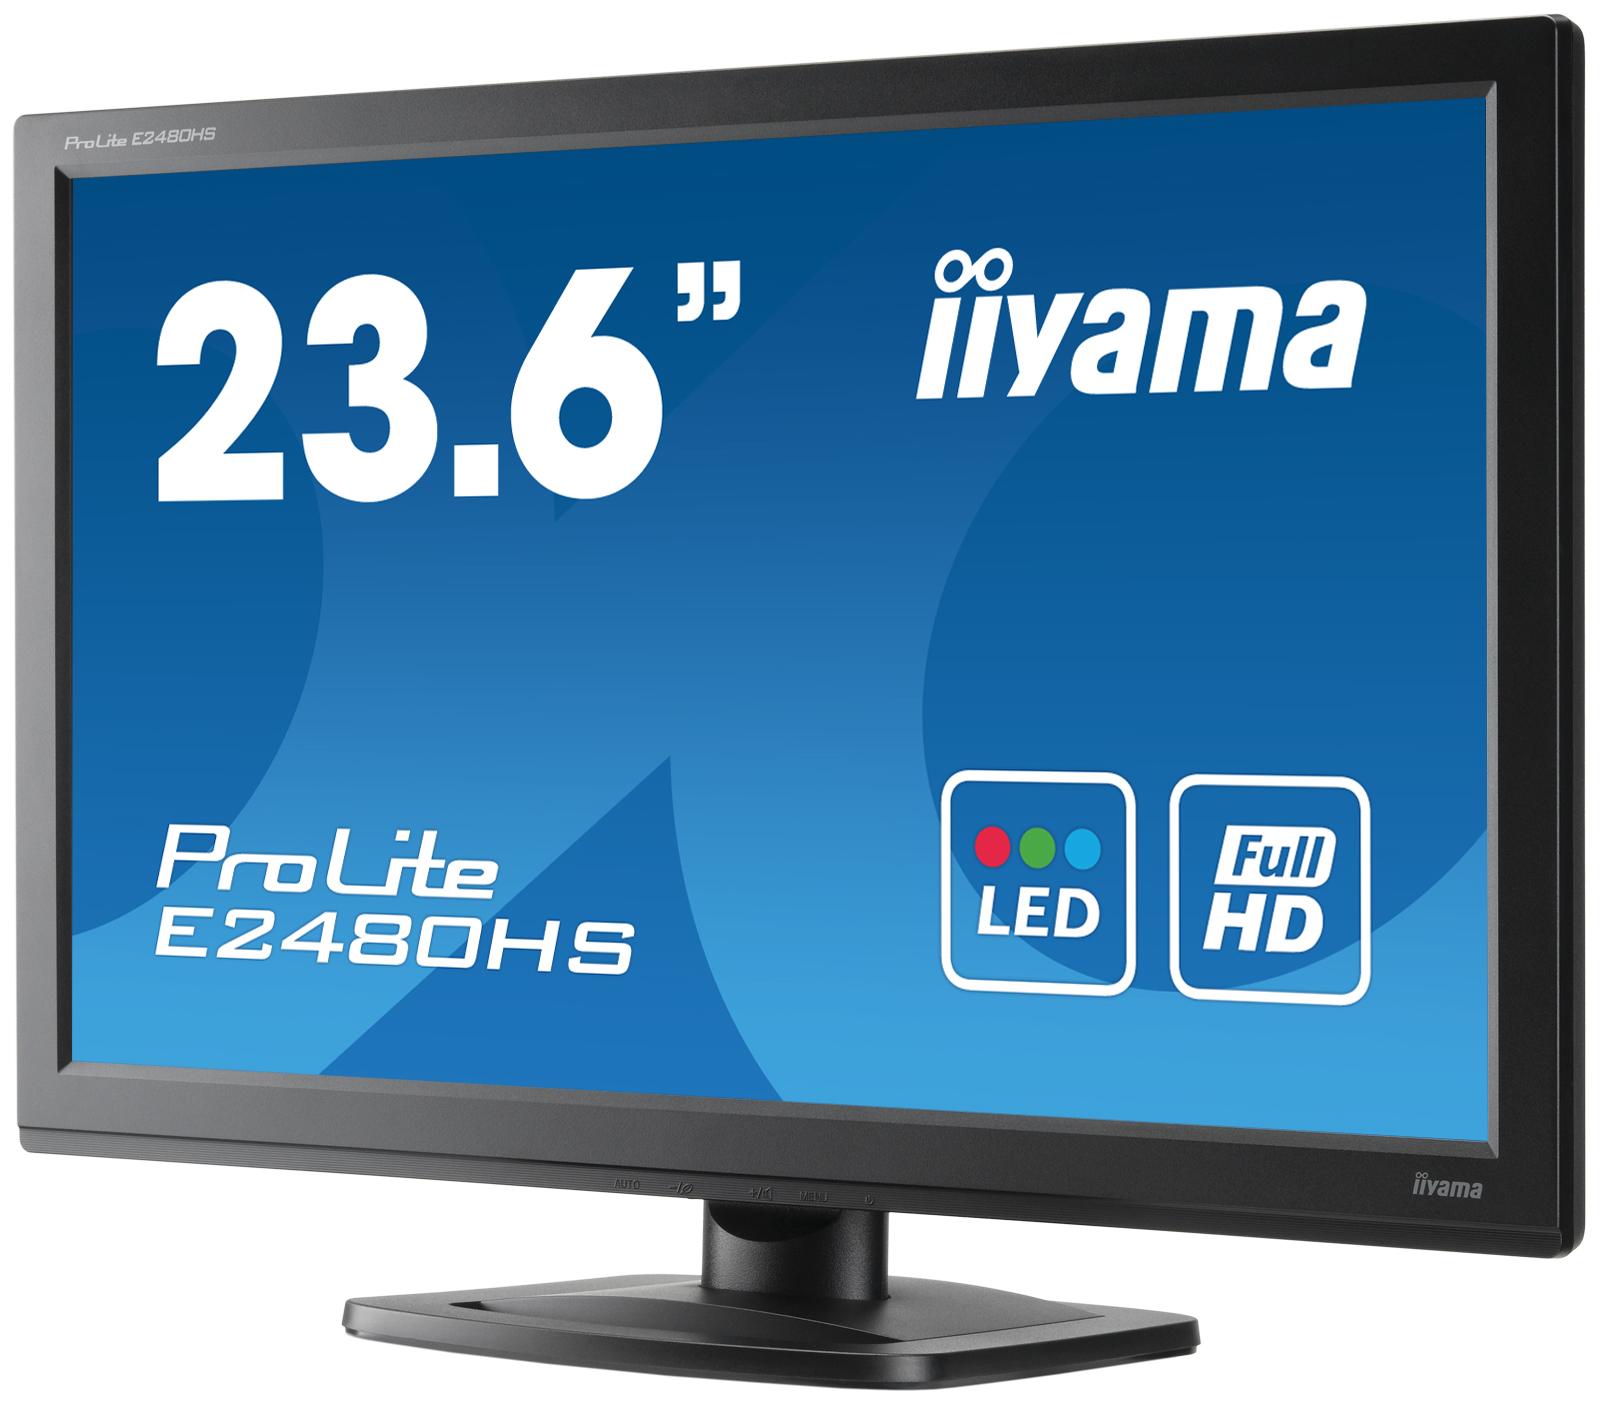 iiyama ProLite E2480HS 23.6